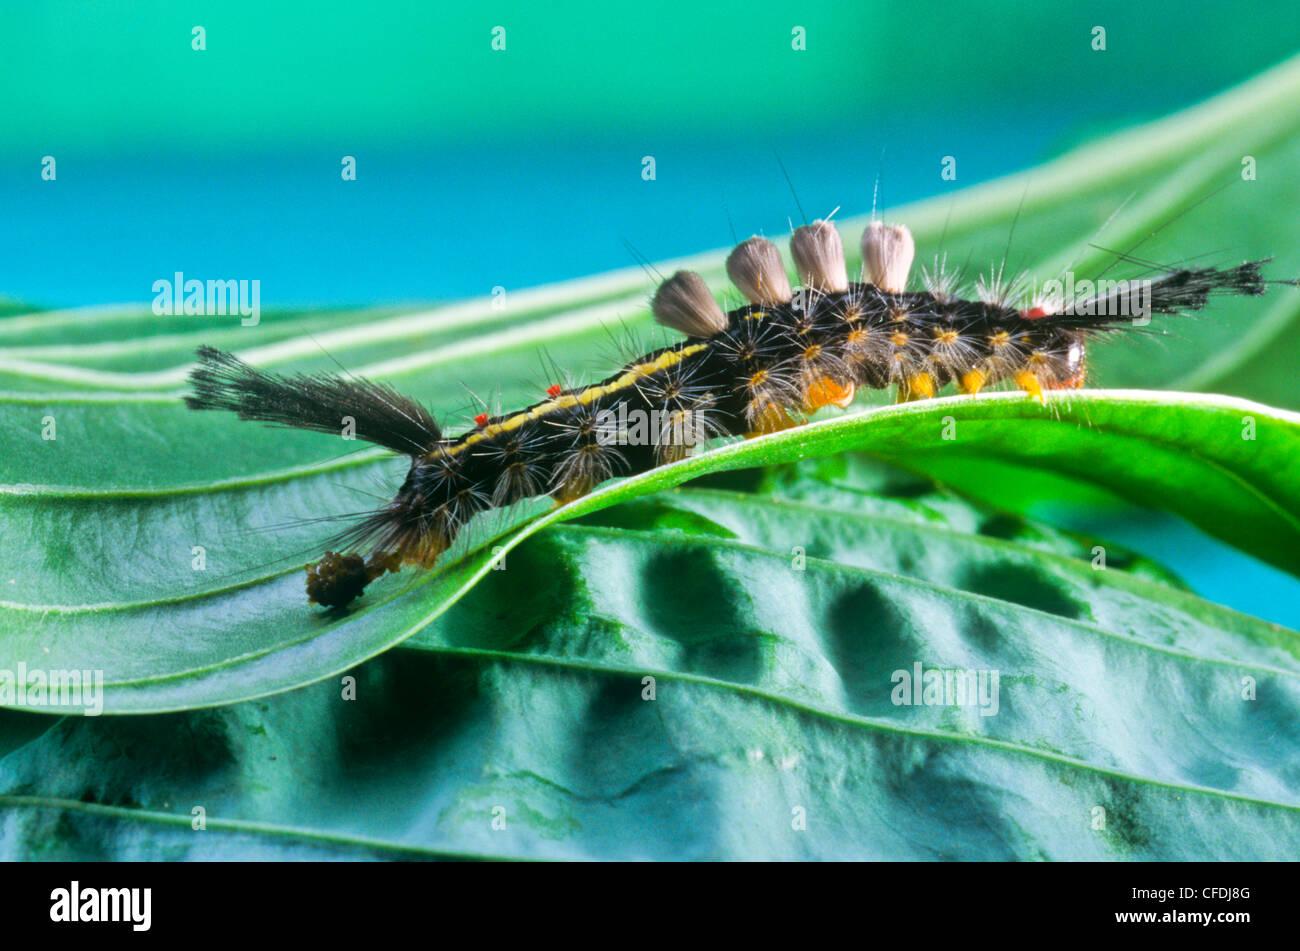 White-marked Tussock Moth larva, (Orgyia leucostigma), caterpillar - Stock Image